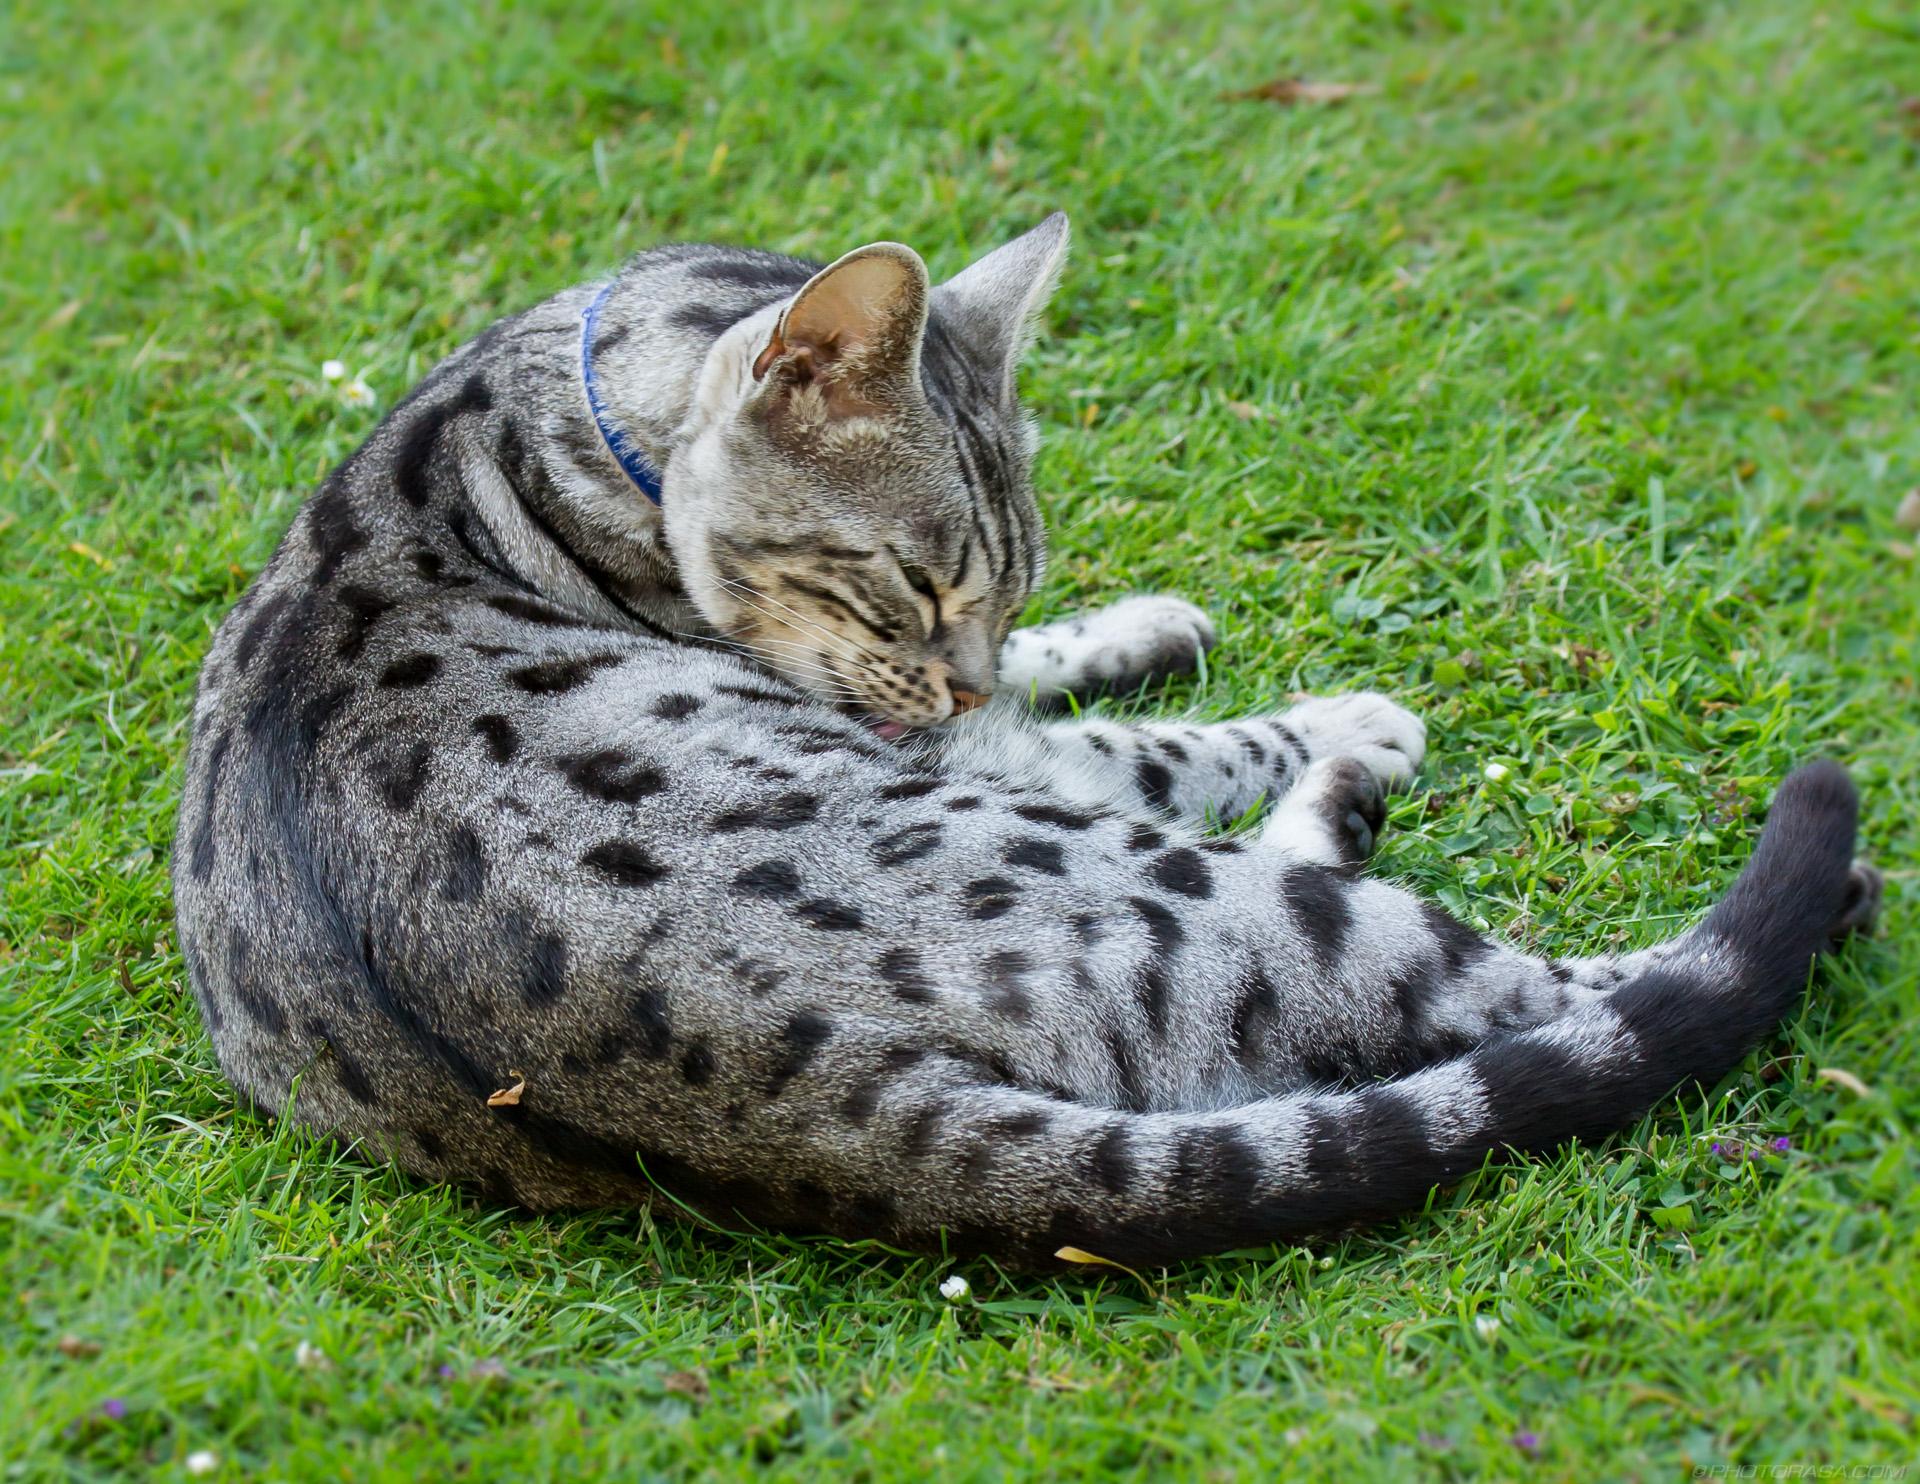 https://photorasa.com/silver-tabby-cat/spotted-silver-pattern-on-tabby-cat/